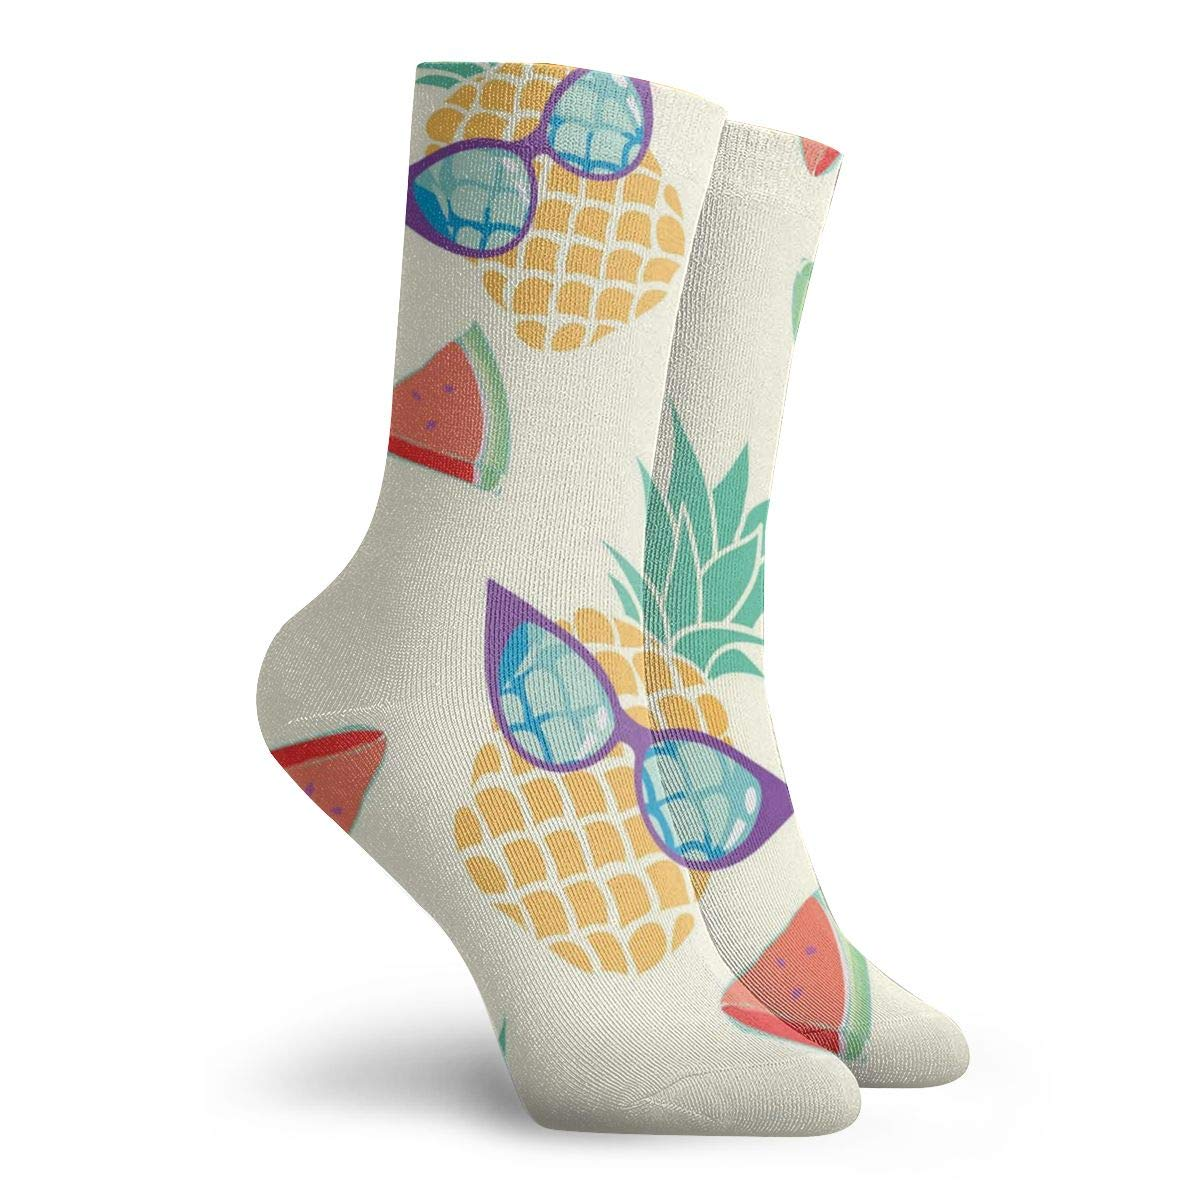 Pineapple Watermelon Lightweight Crew Socks For Womens Cotton Socks